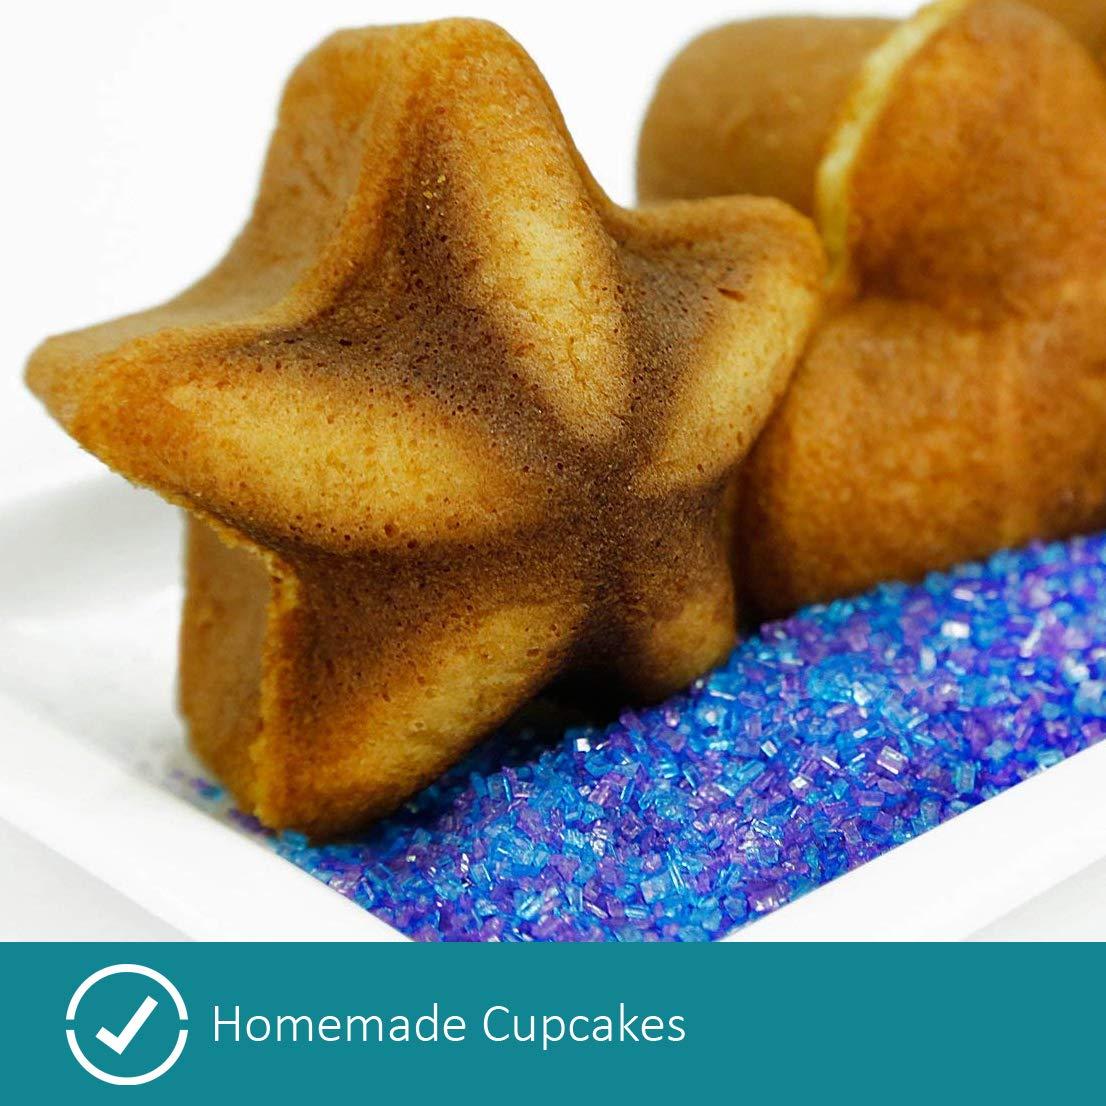 Holstein Housewares HF-09034M Star & Heart Cupcake Maker - Magenta by Holstein Housewares (Image #5)